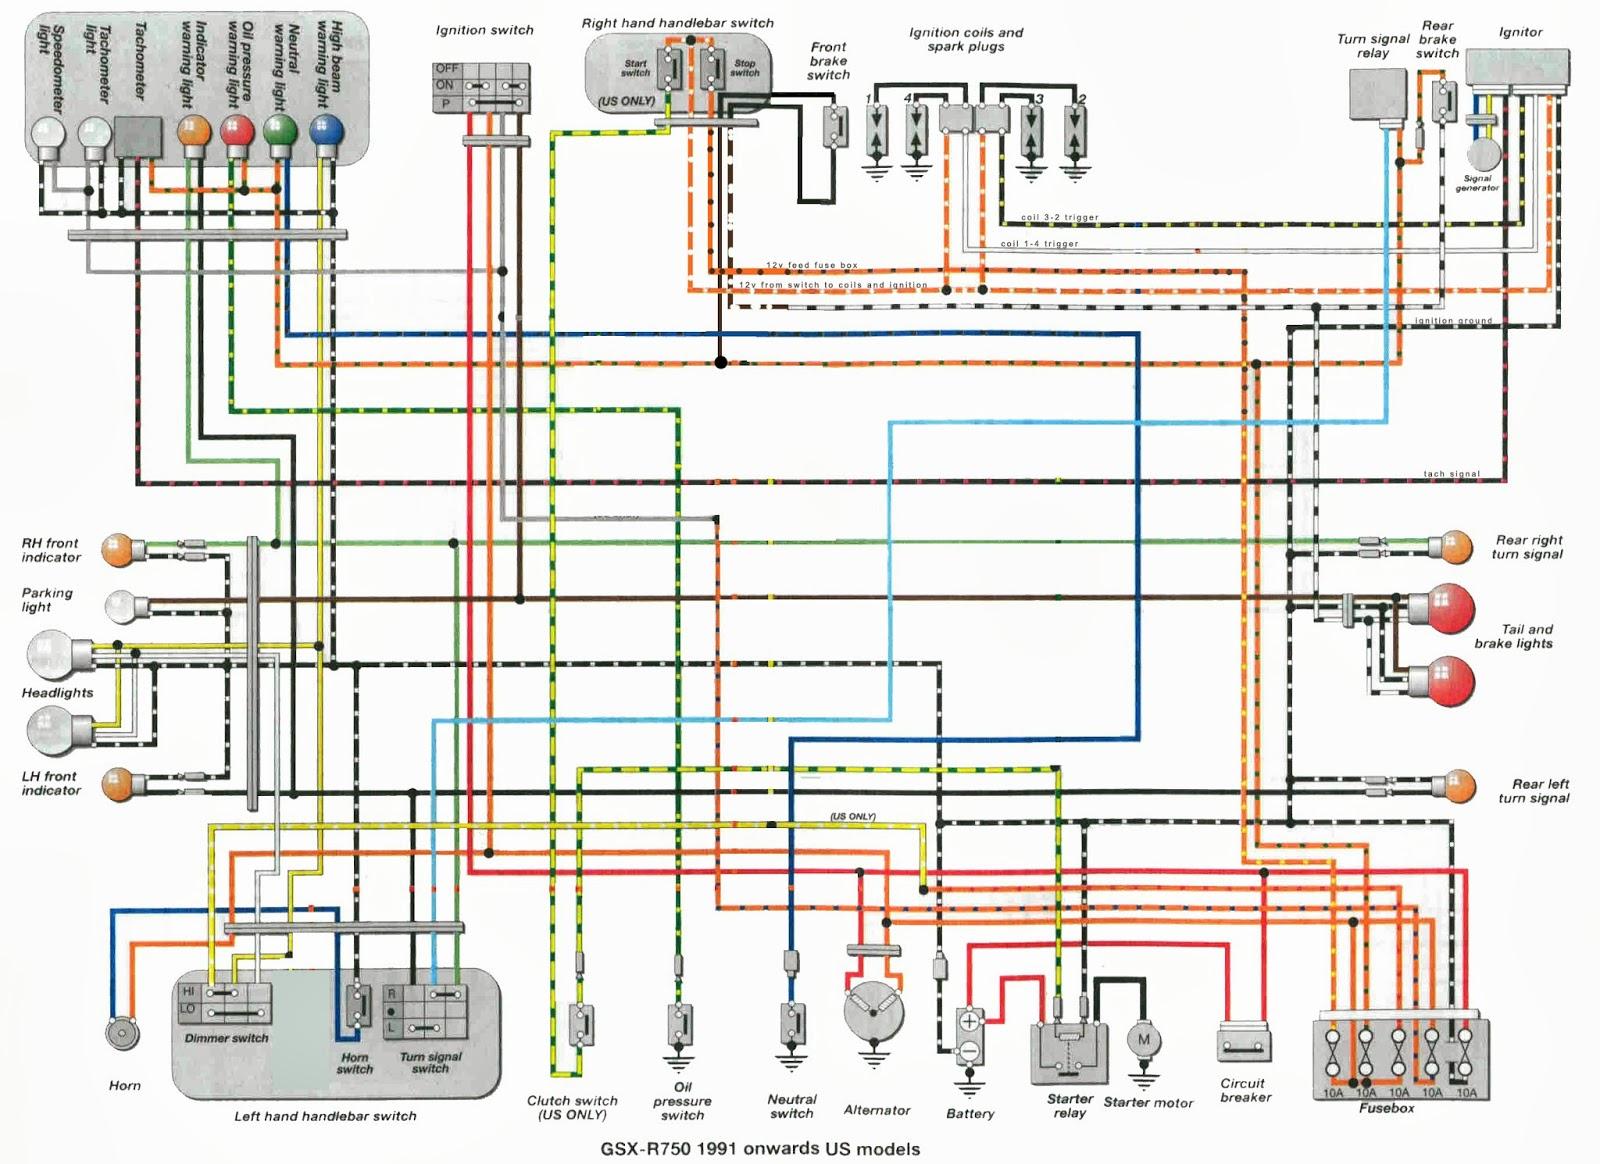 gsxr 1100 wiring diagram gsxr wiring identification please oss gsx 06 Gsxr 750 Wiring Diagram suzuki gsxr wiring diagram the wiring 2006 gsxr 1000 wiring schematic diagram and 06 gsxr 750 wiring diagram